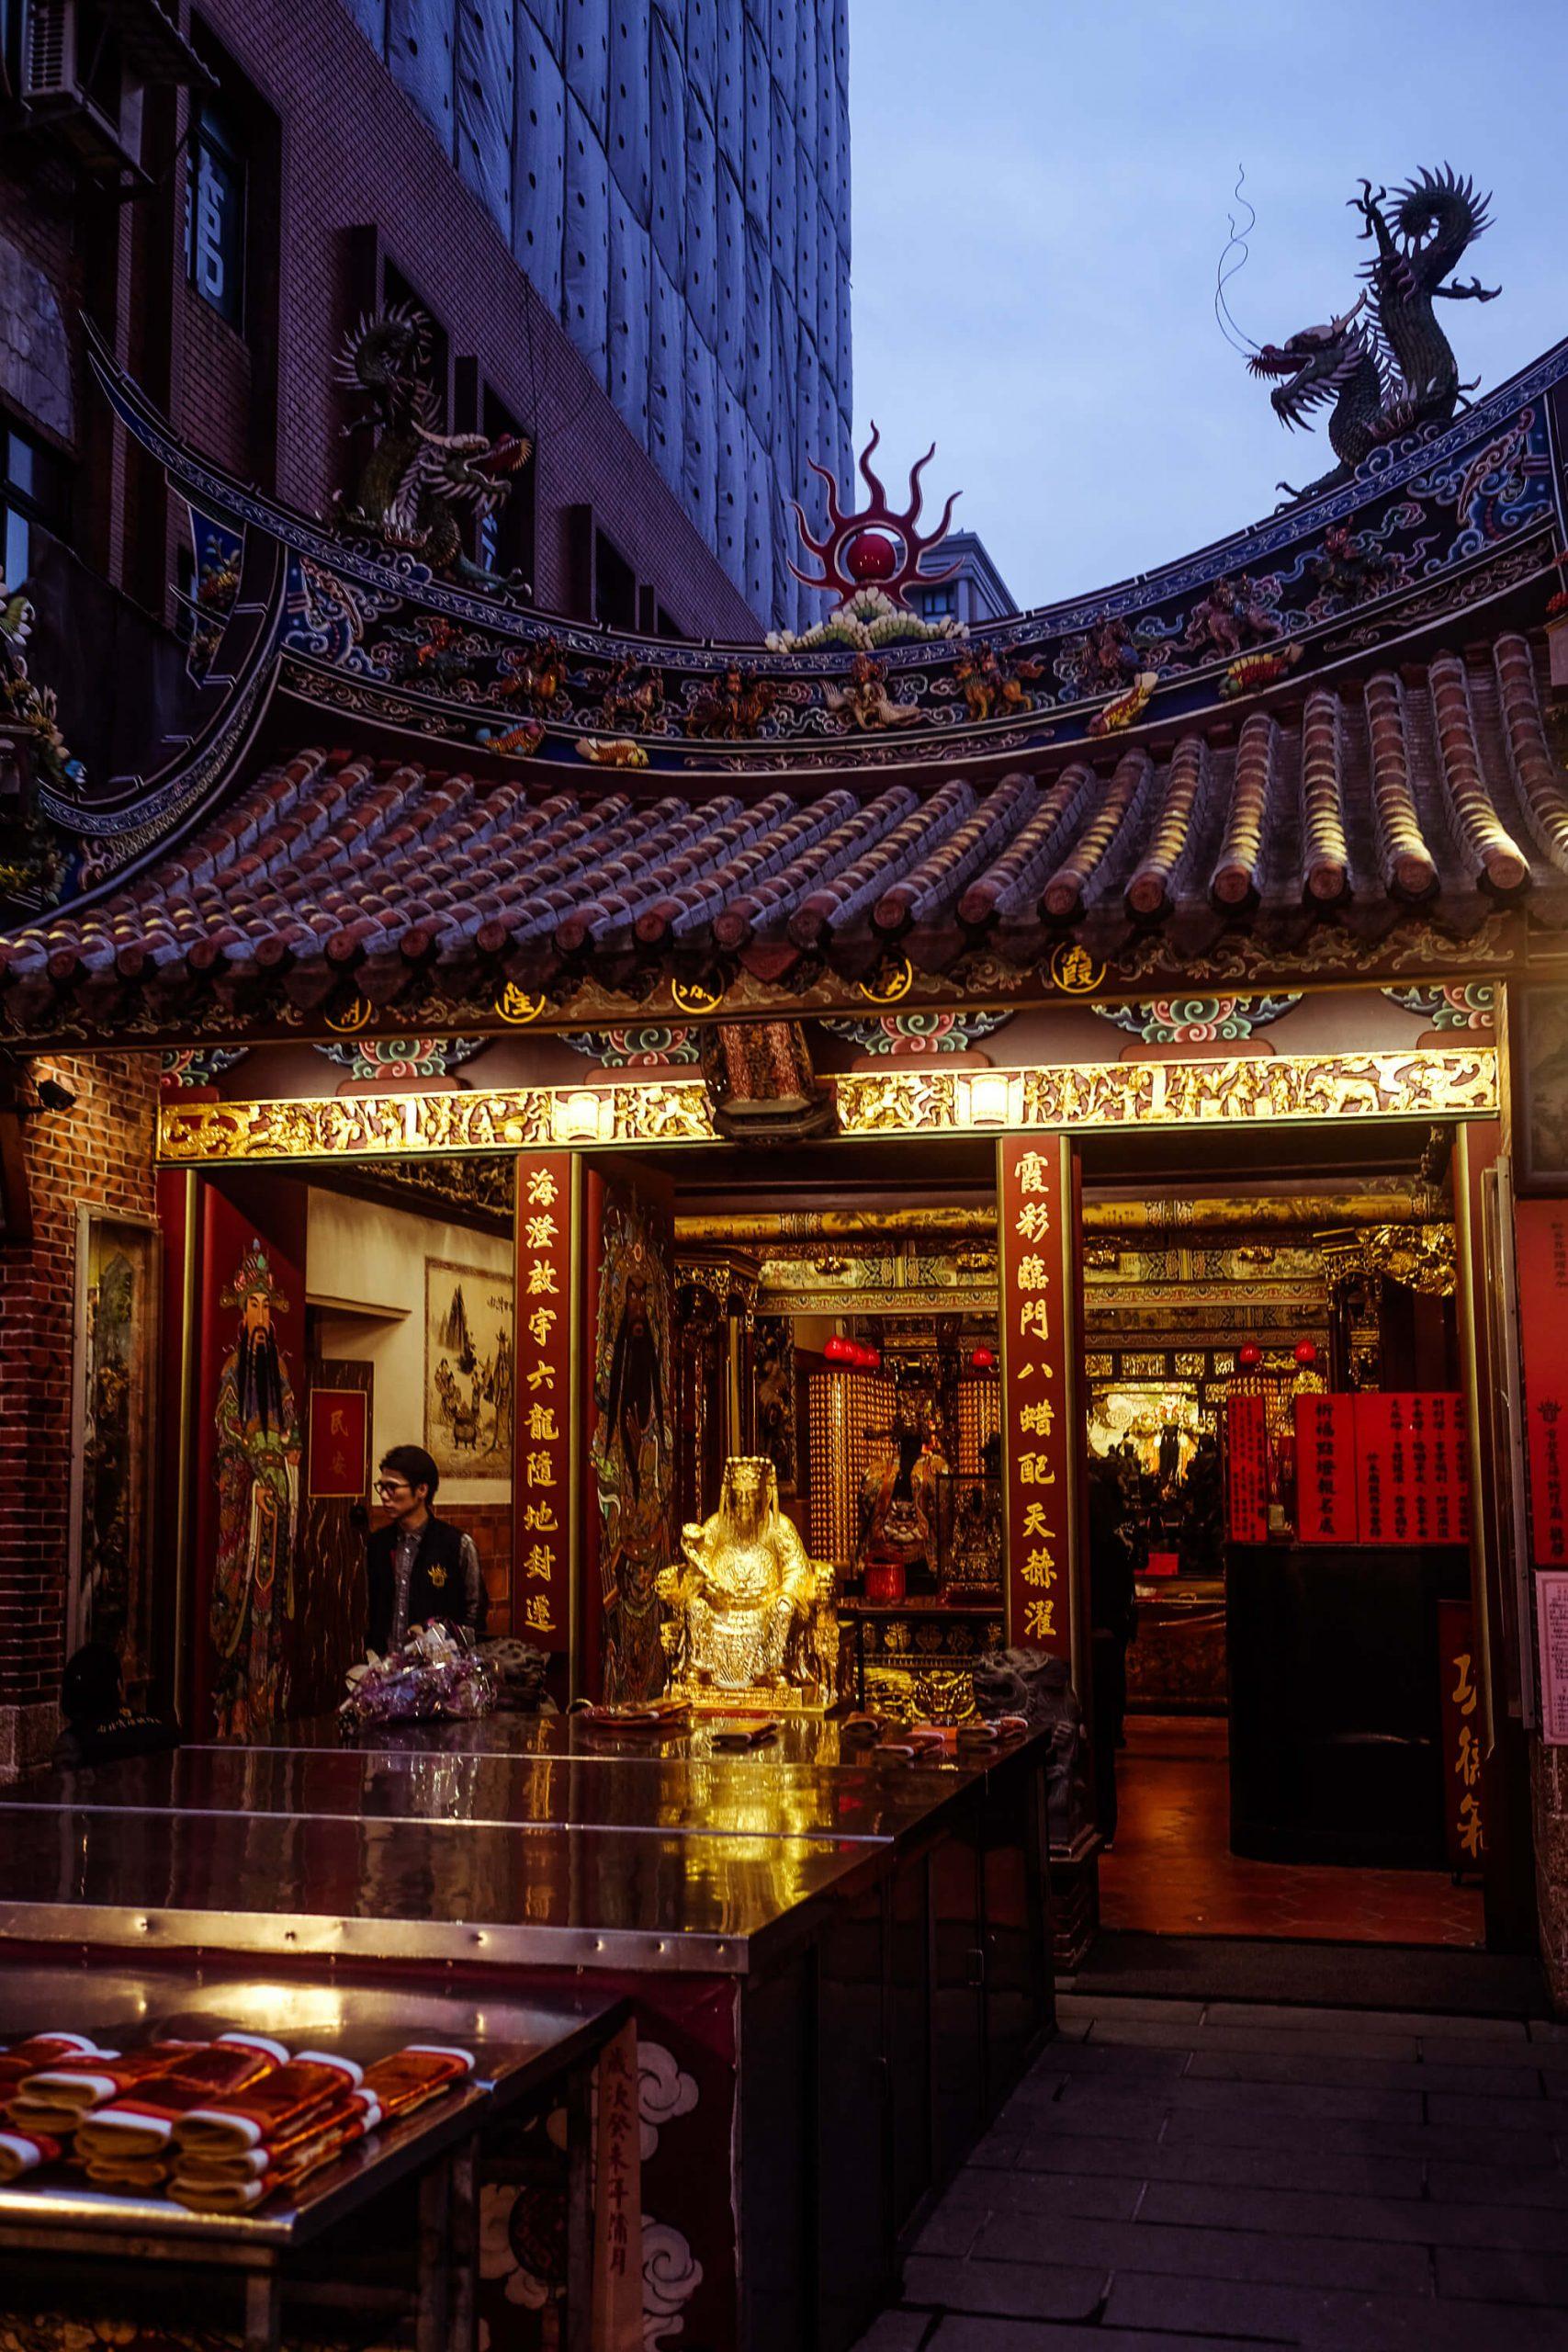 elisabetta riccio - urban vision - entrance of a sacred temple in Taipei city